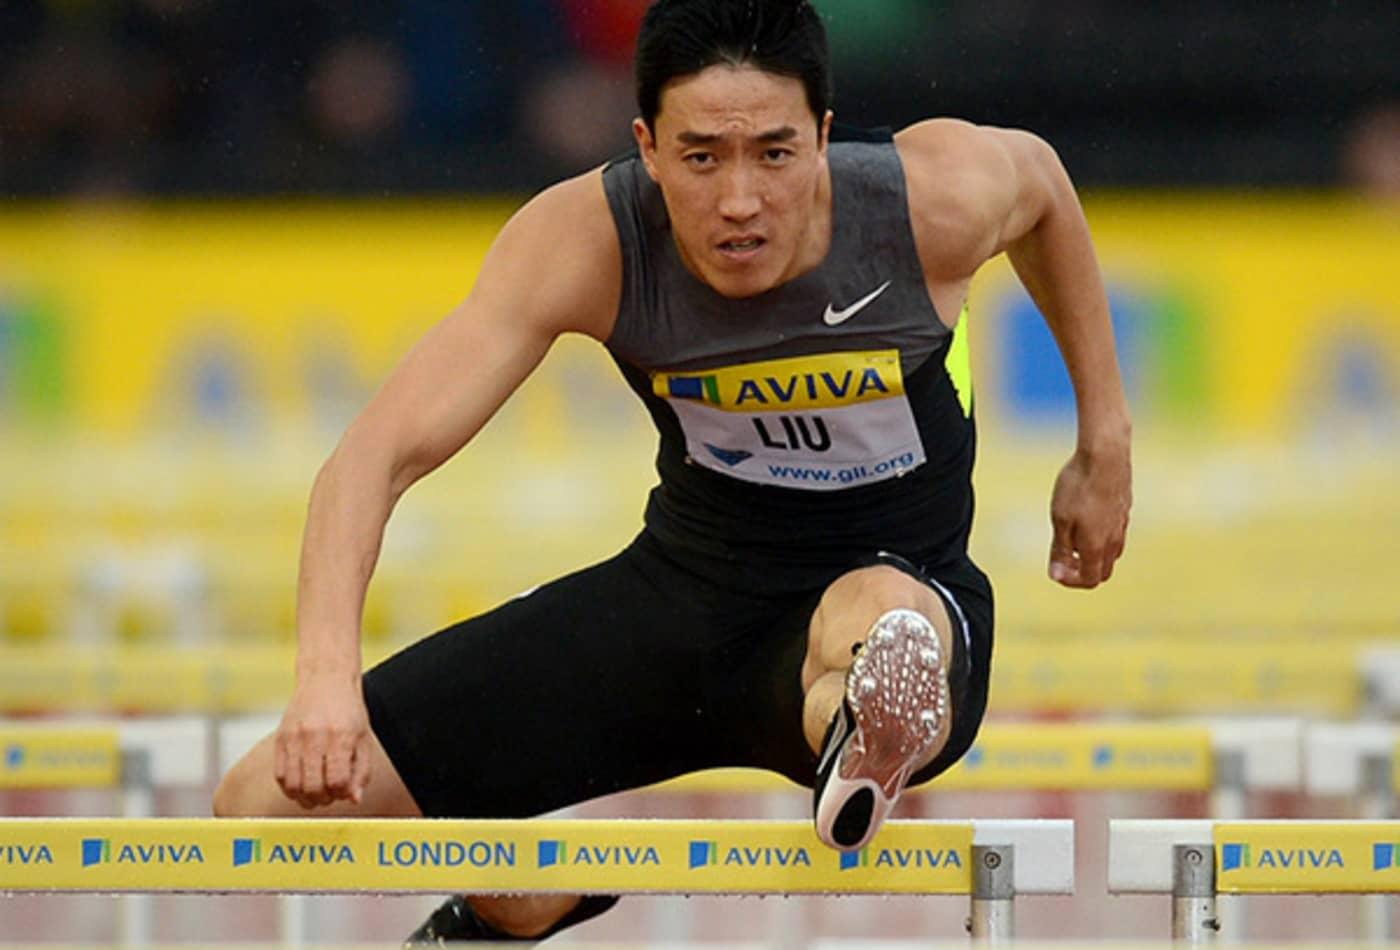 10-Most-Marketable-Summer-Olympians-liu-xiang.jpg